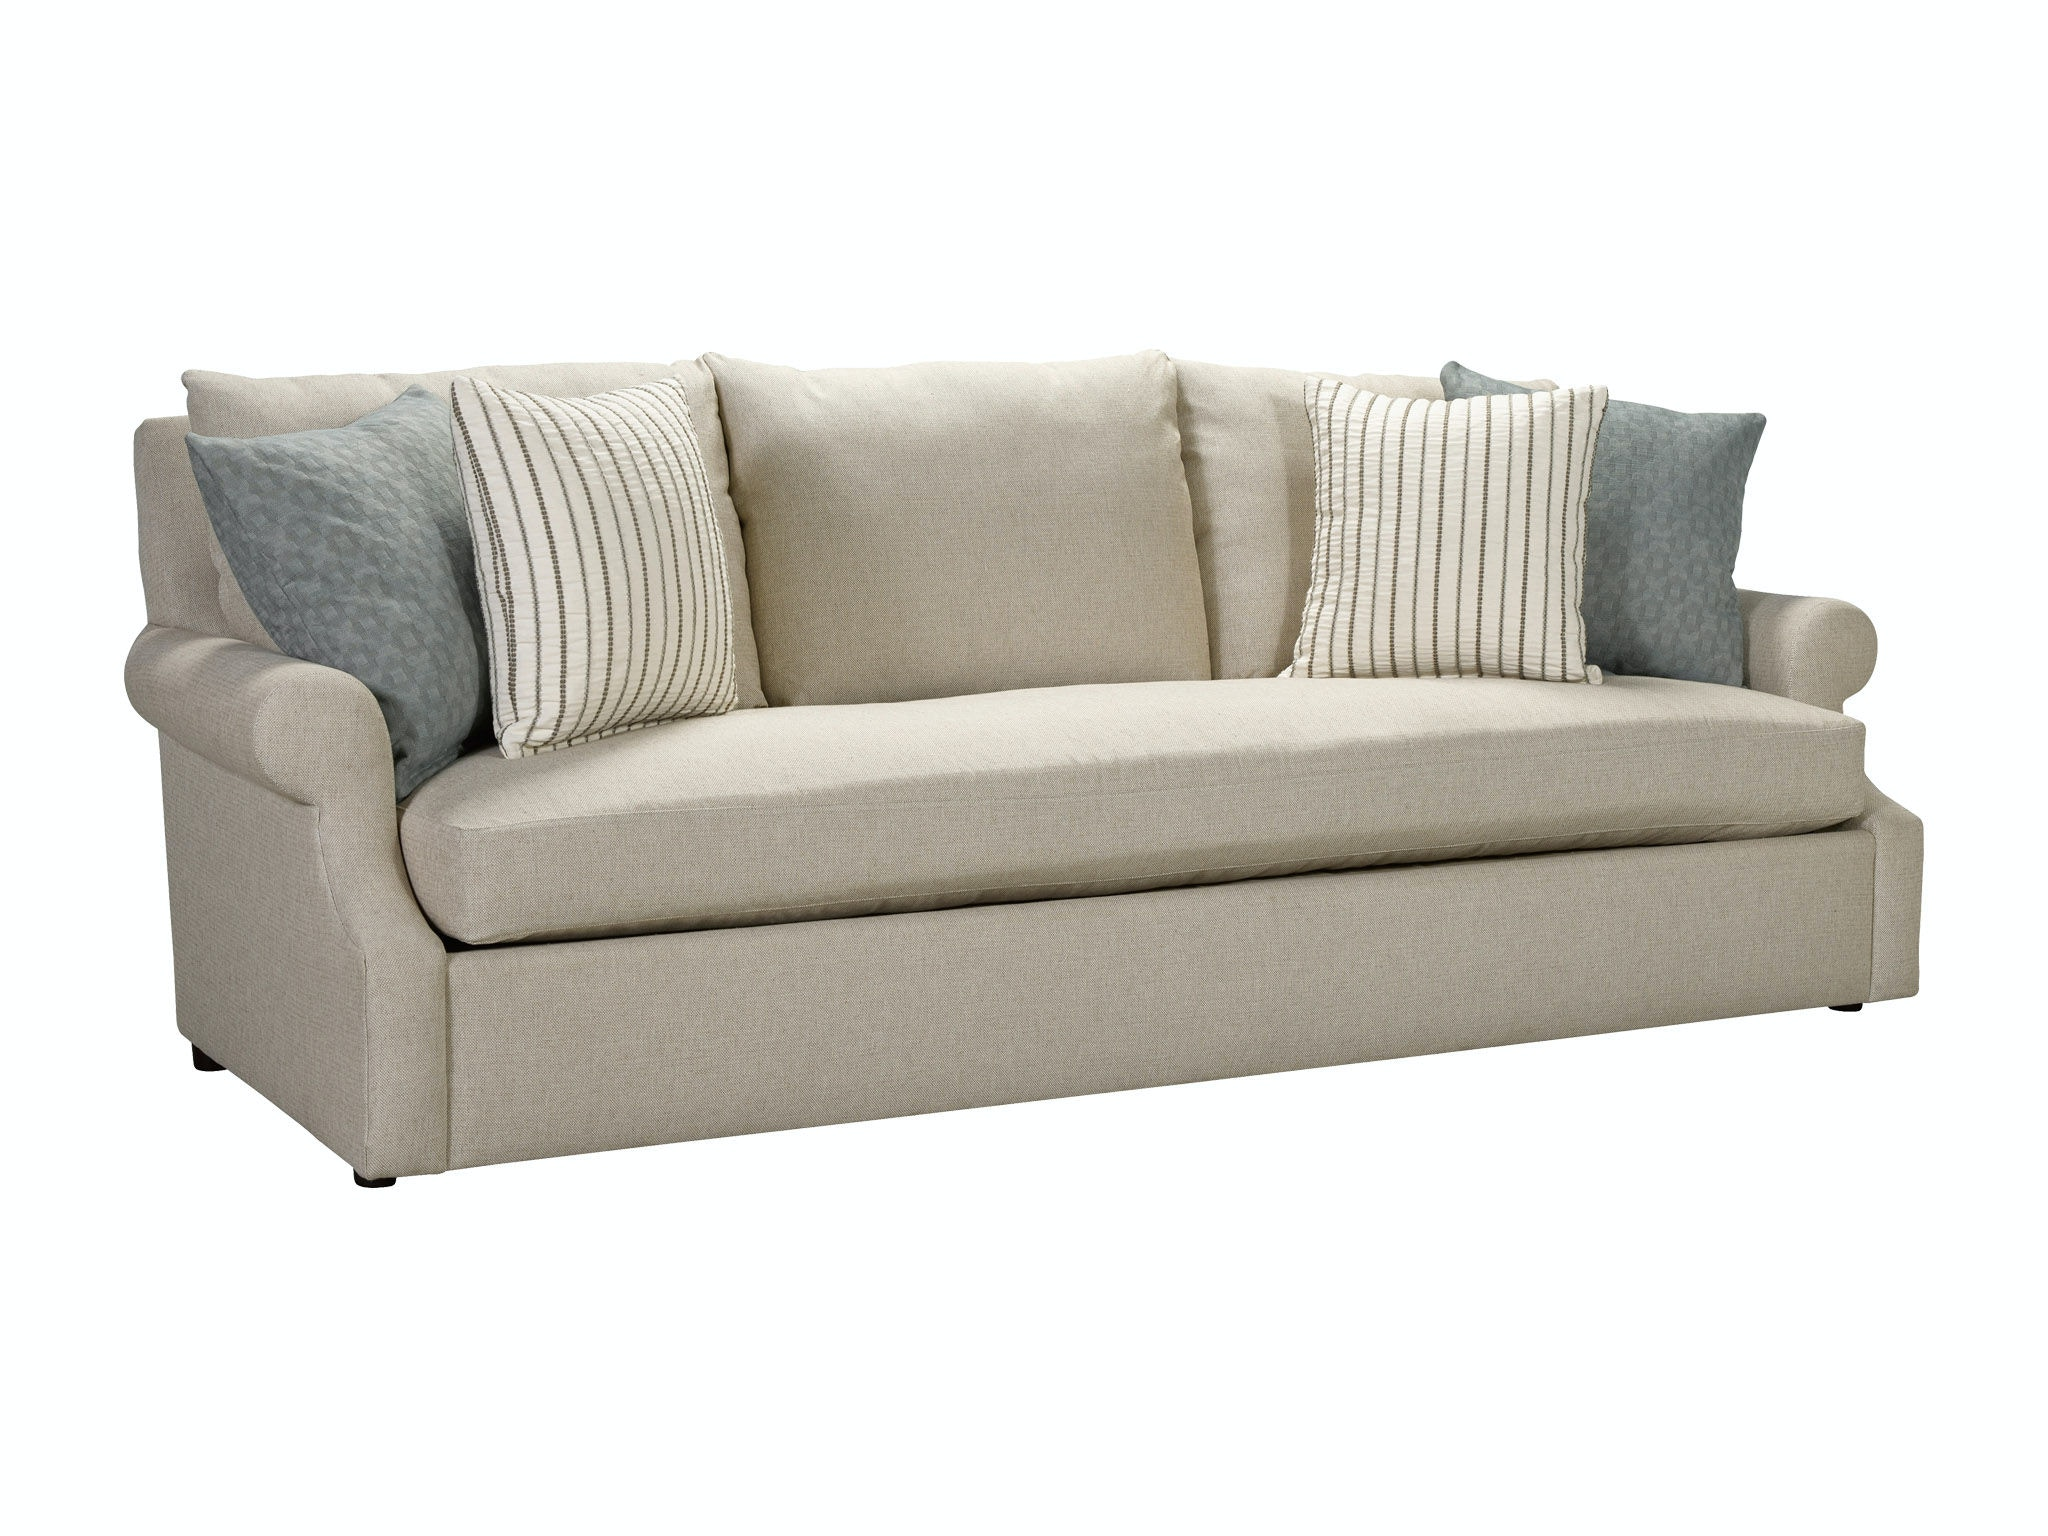 broyhill floral sofa ikea kivik living room willa 4216 300 burke furniture